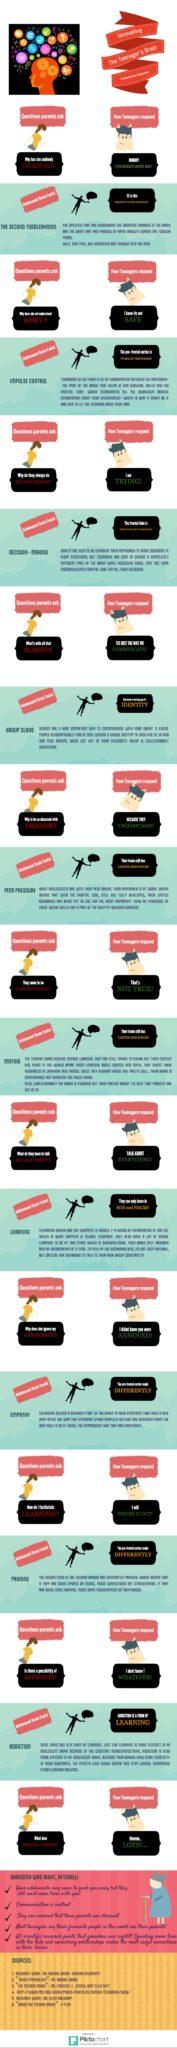 teen brain infographic